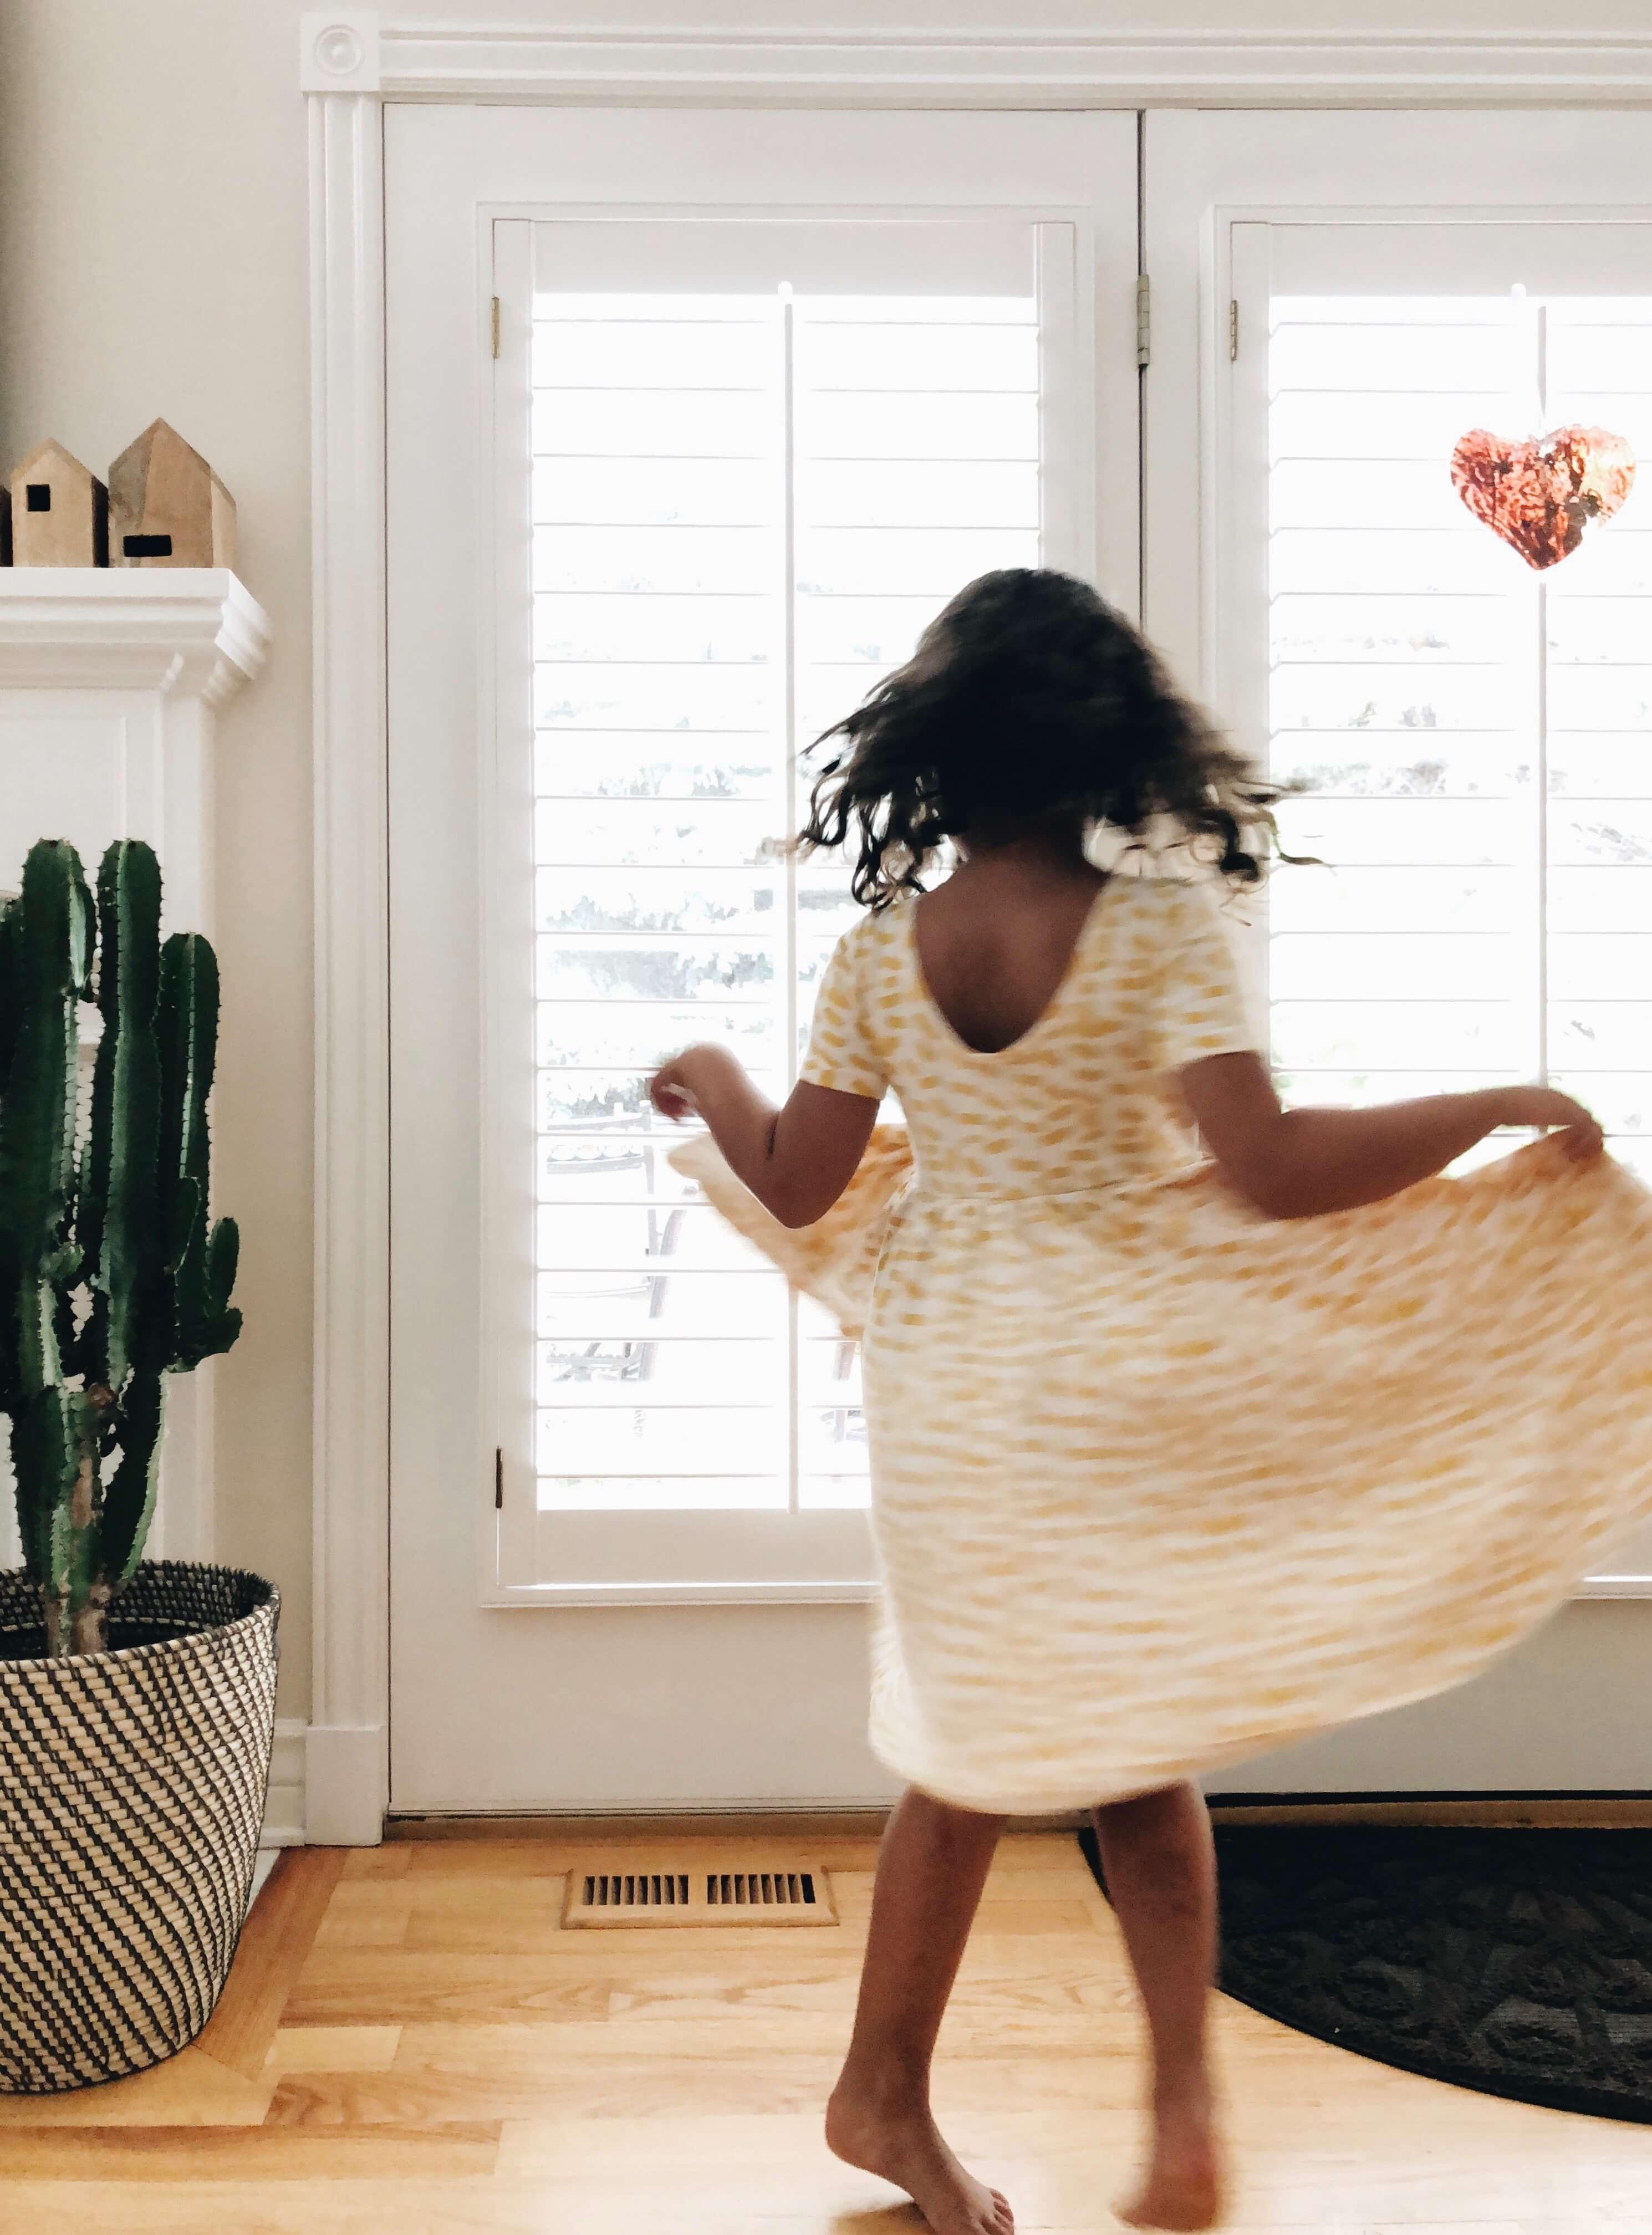 Blurry photo of little girl in polka-dot dress twirling whimsically